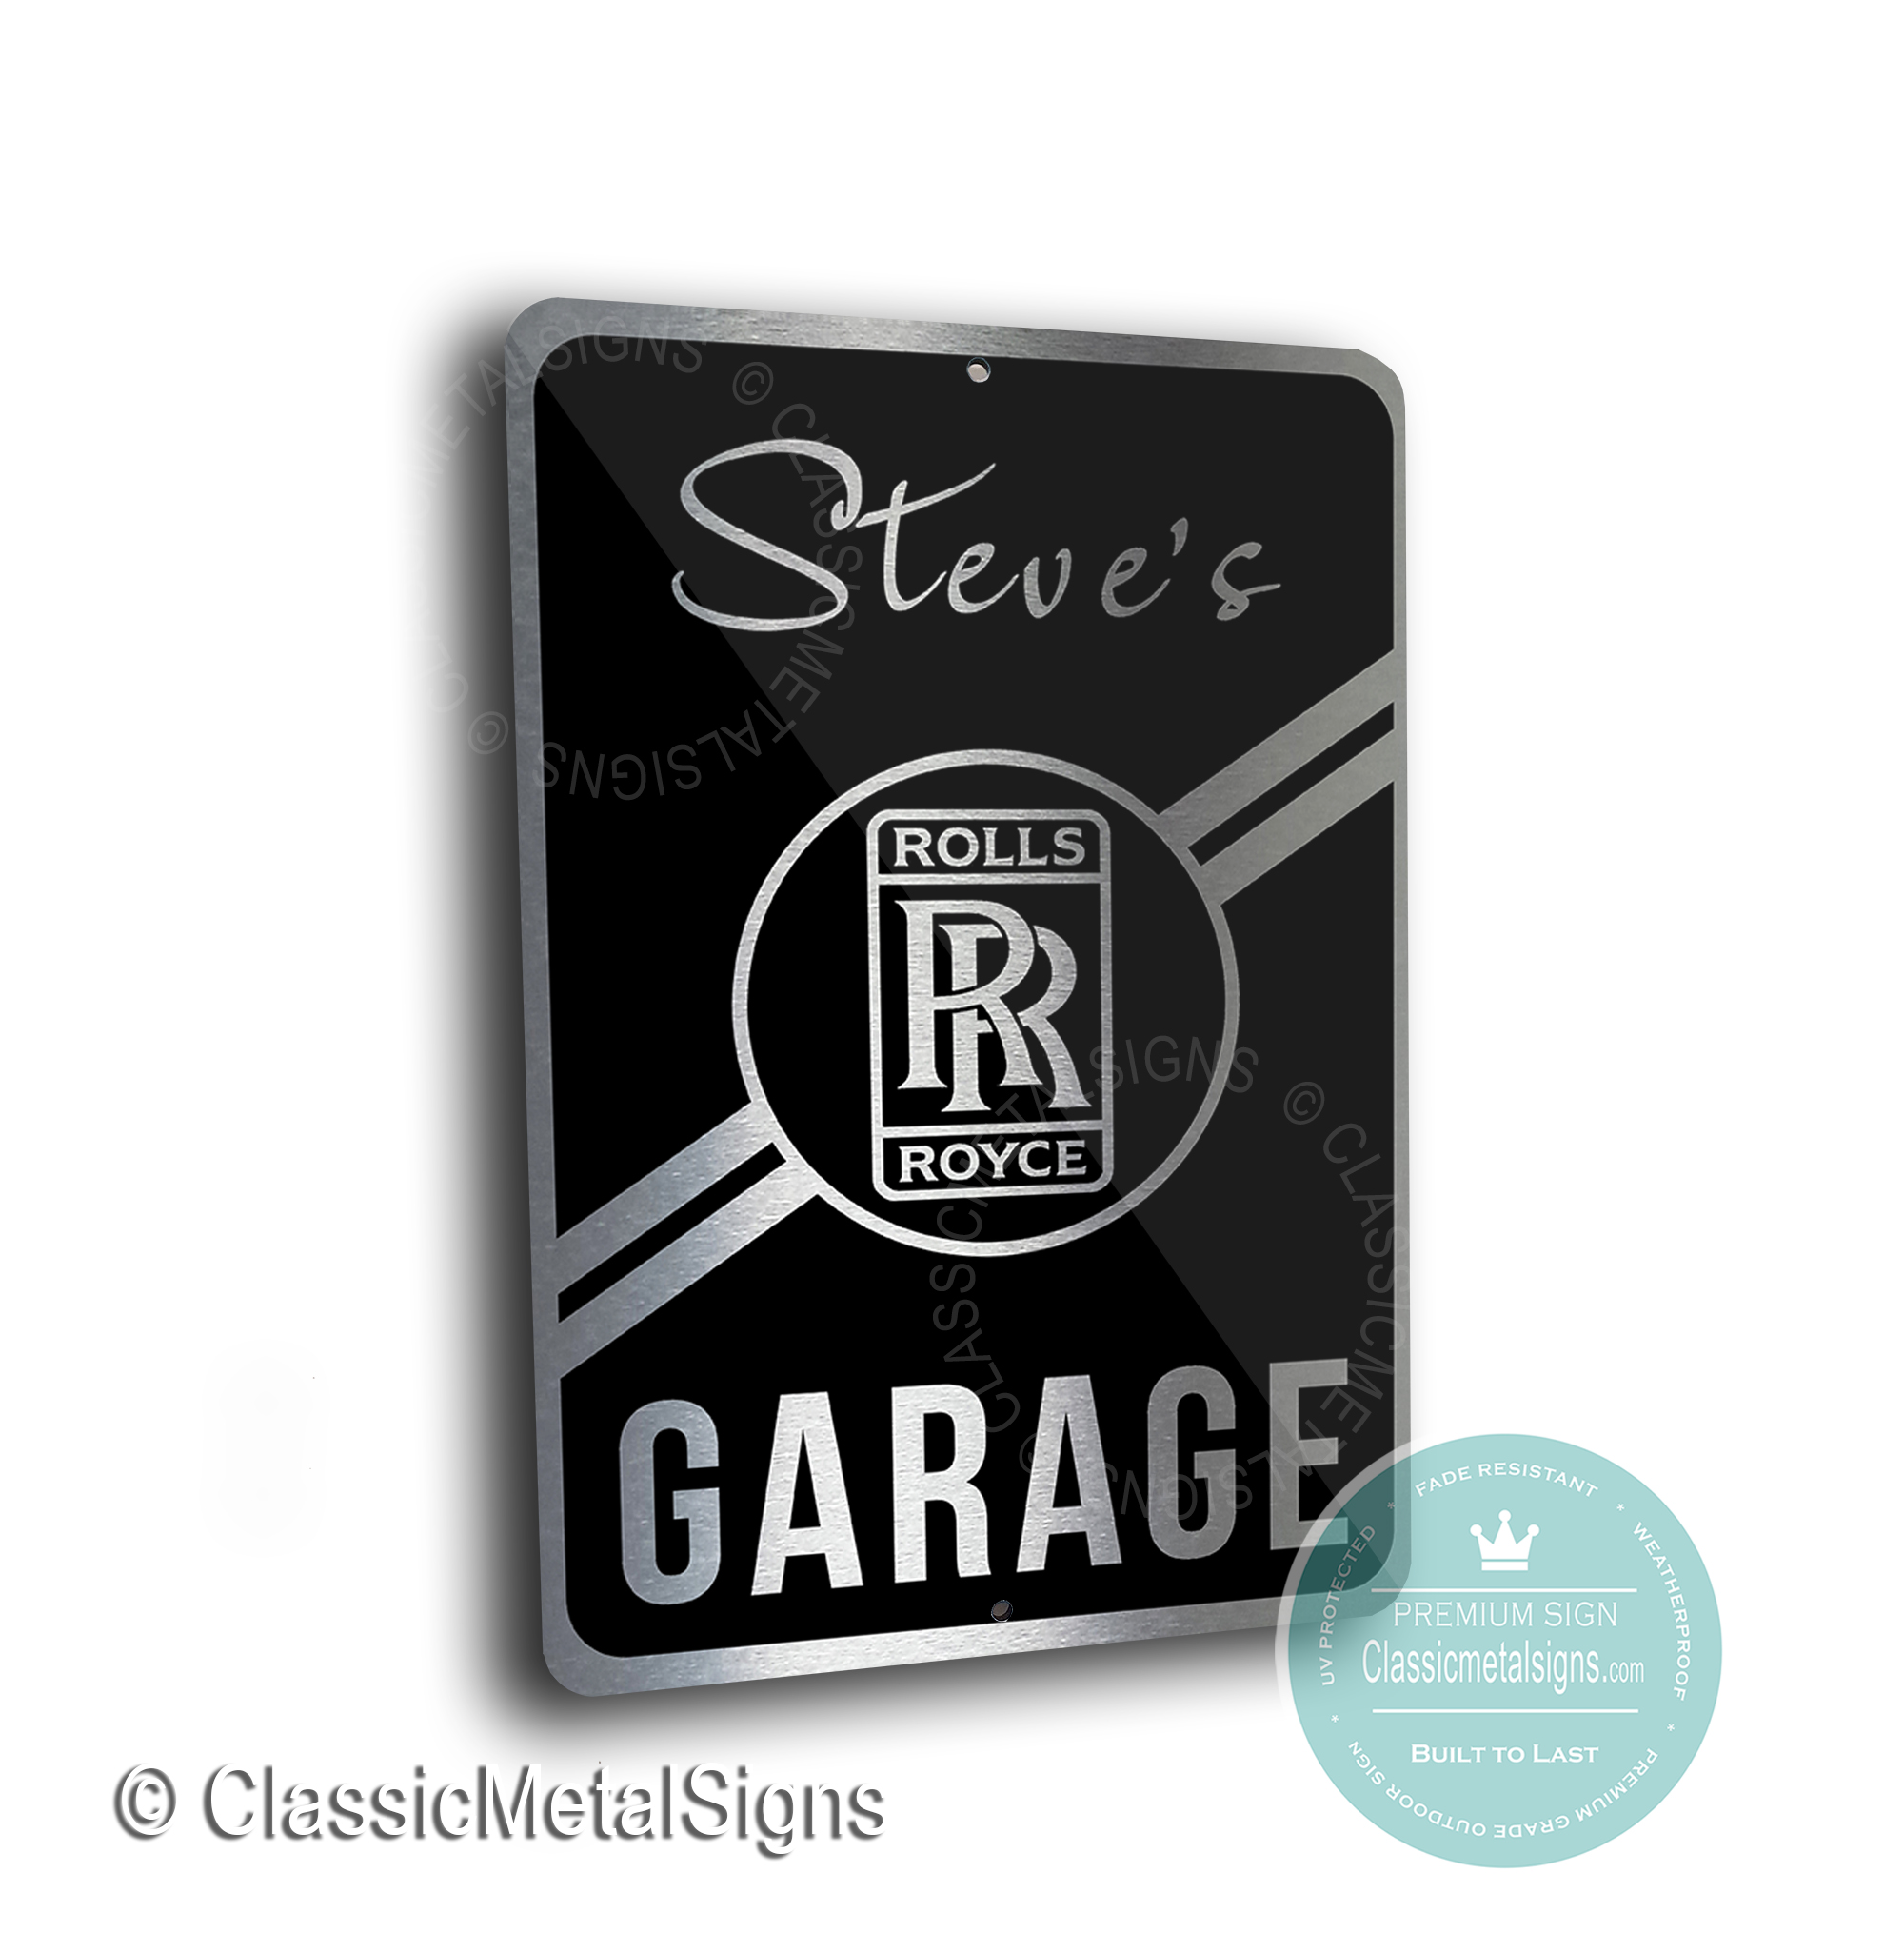 Rolls Royce Garage Signs